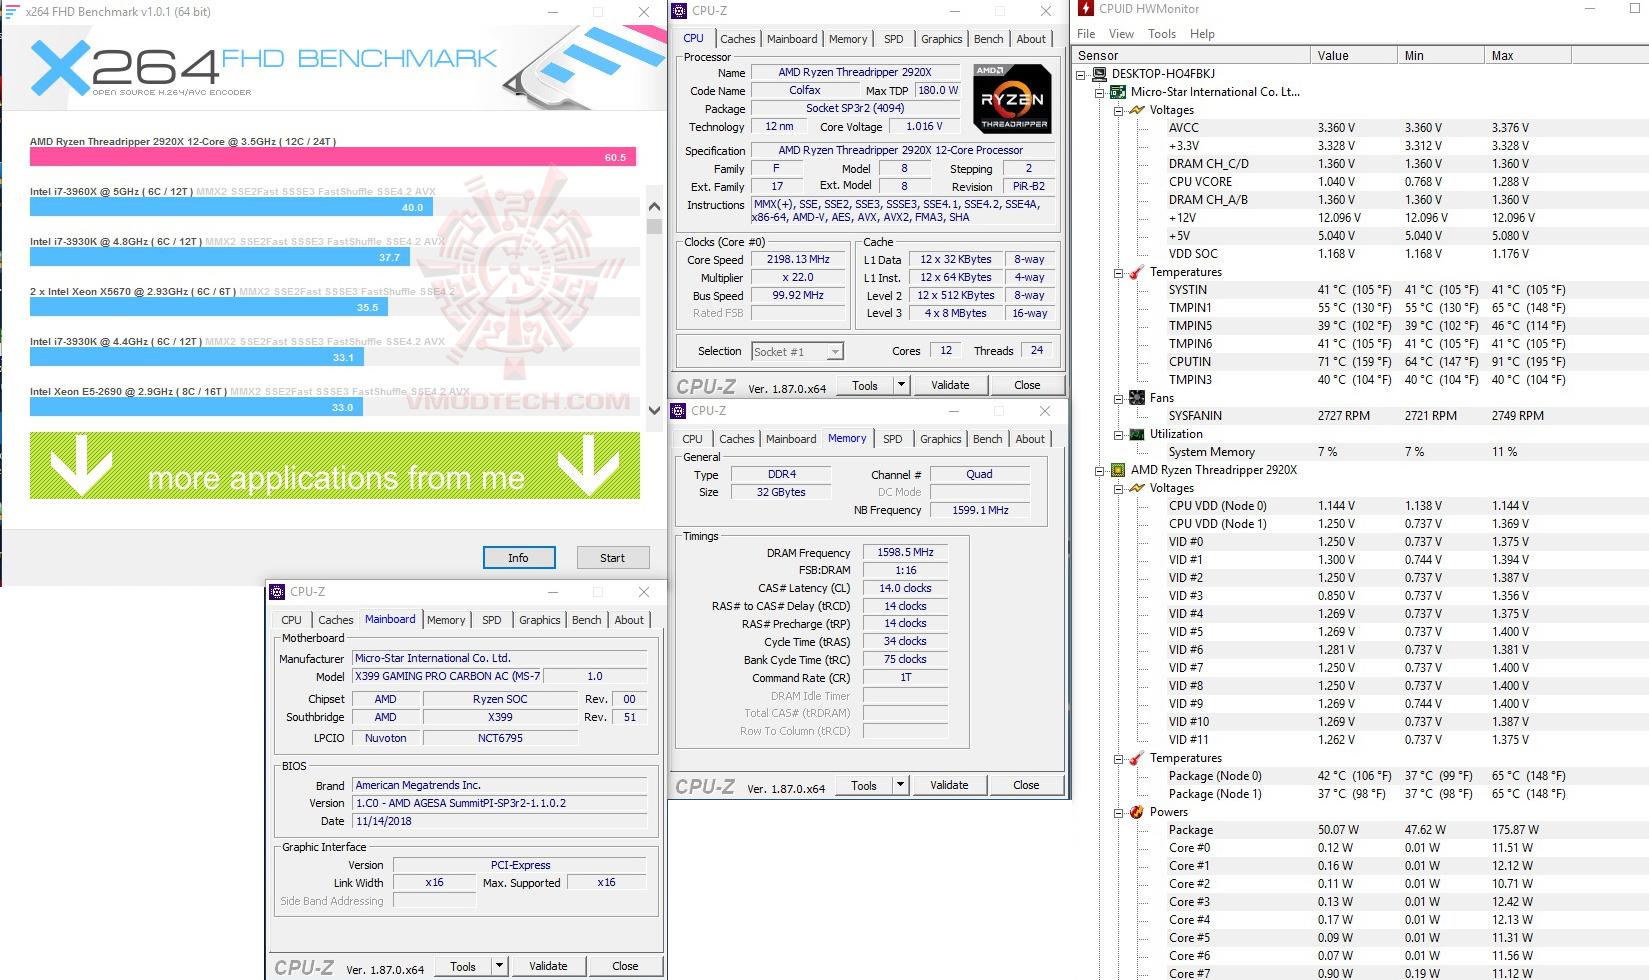 x264 AMD RYZEN THREADRIPPER 2920X PROCESSOR REVIEW